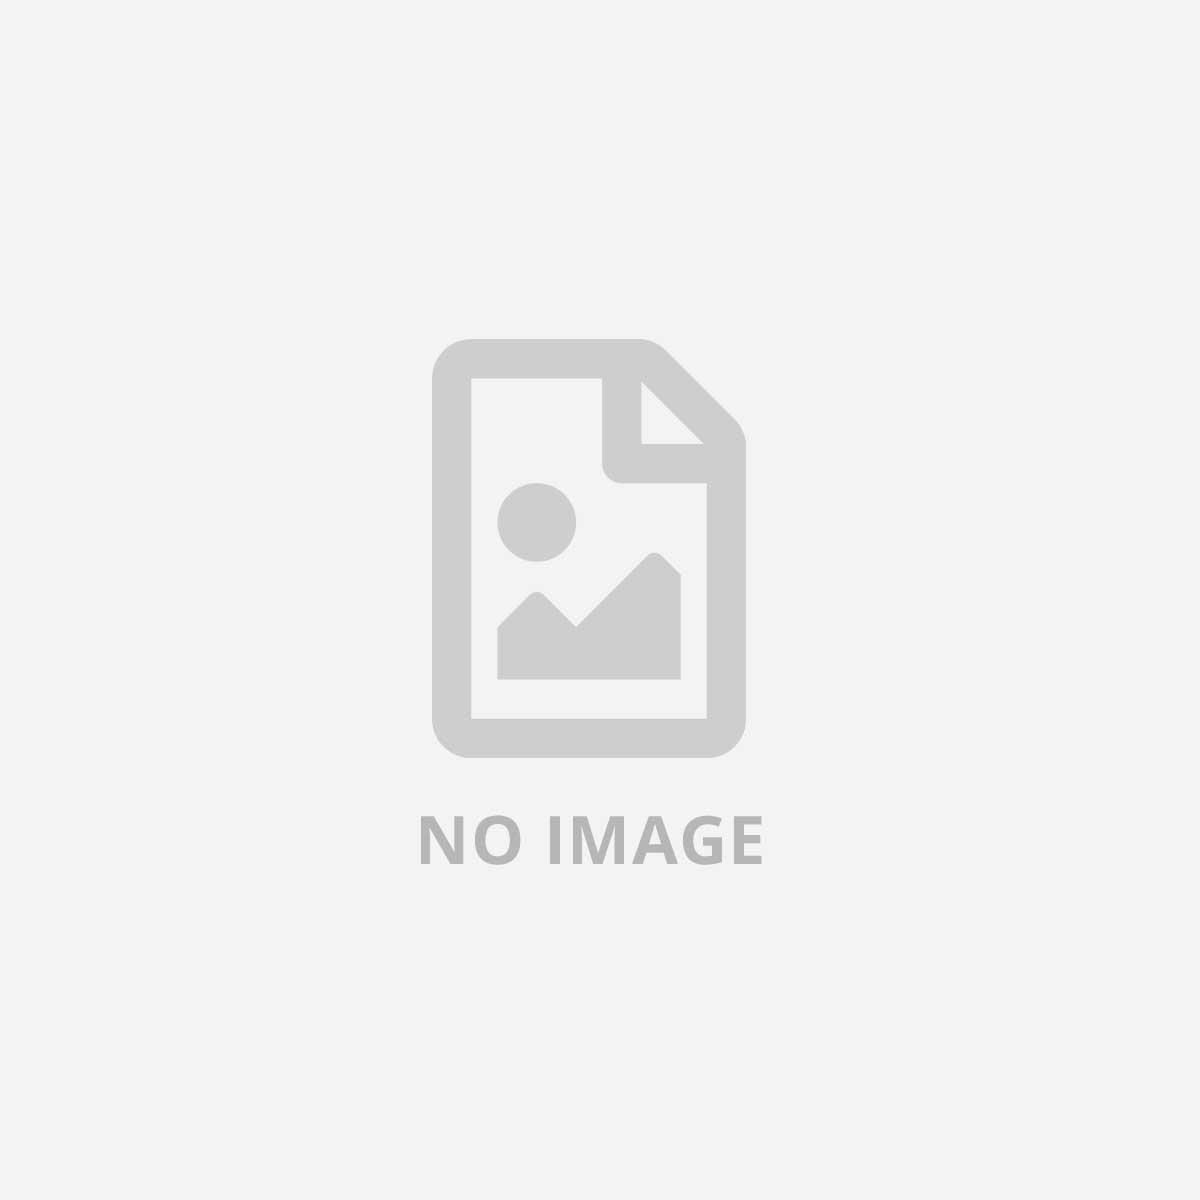 KINGSTON 2GB 1333MHZ DDR3L NON-ECC CL9